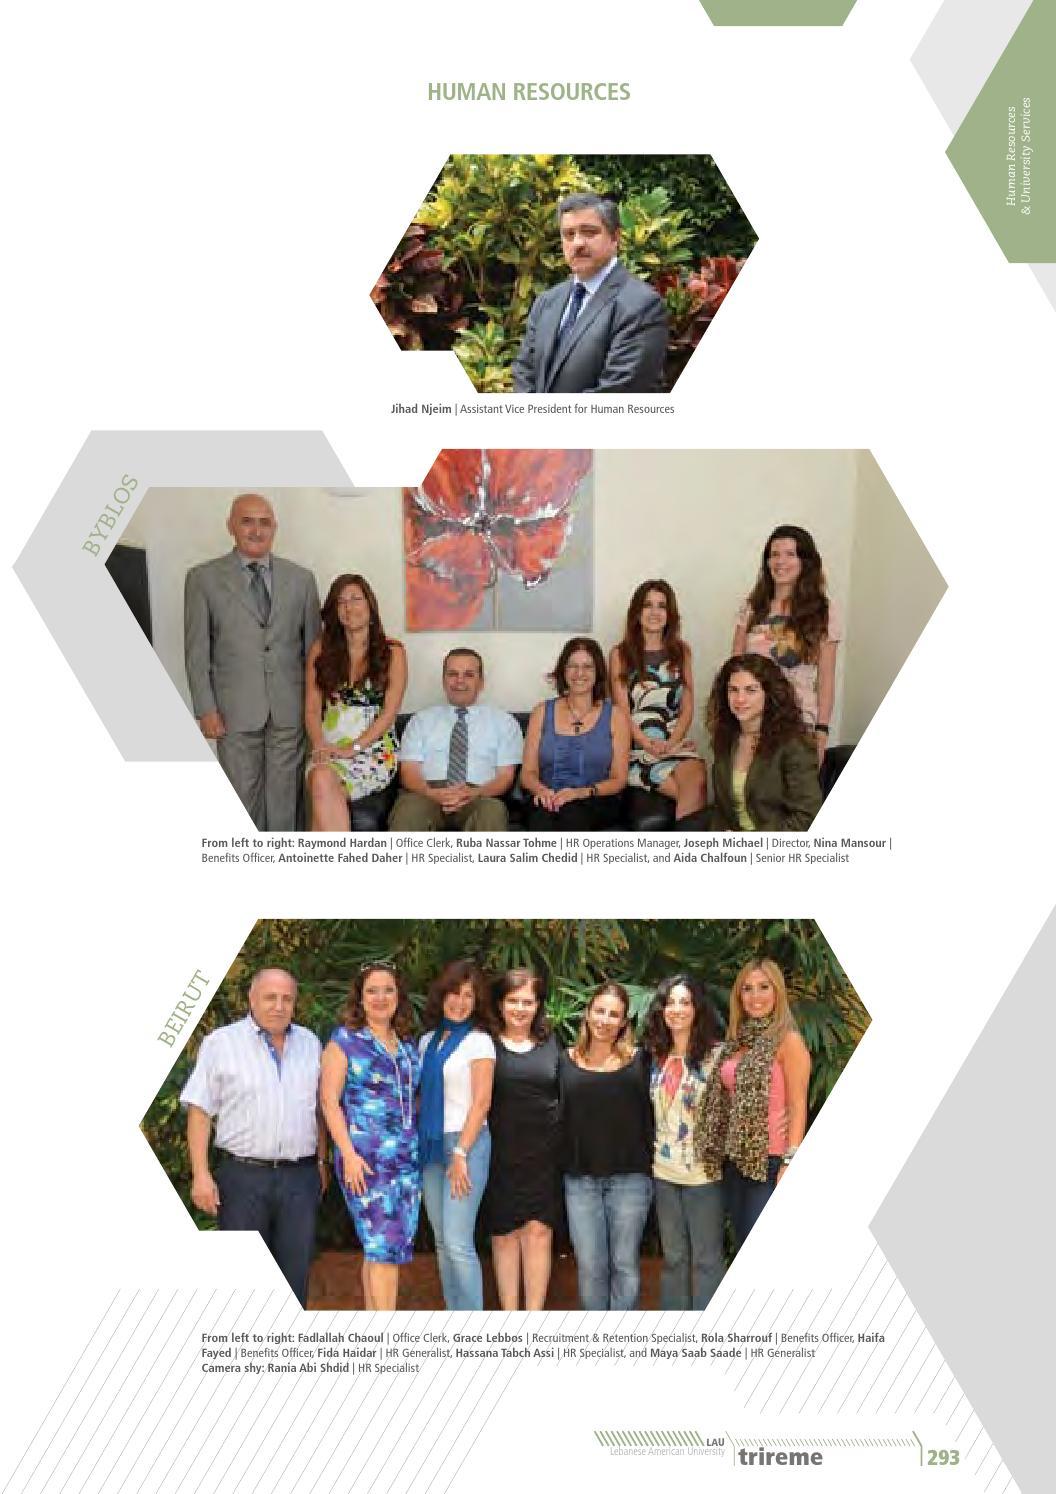 lau trireme 2013 by lebanese american university page 295 issuu